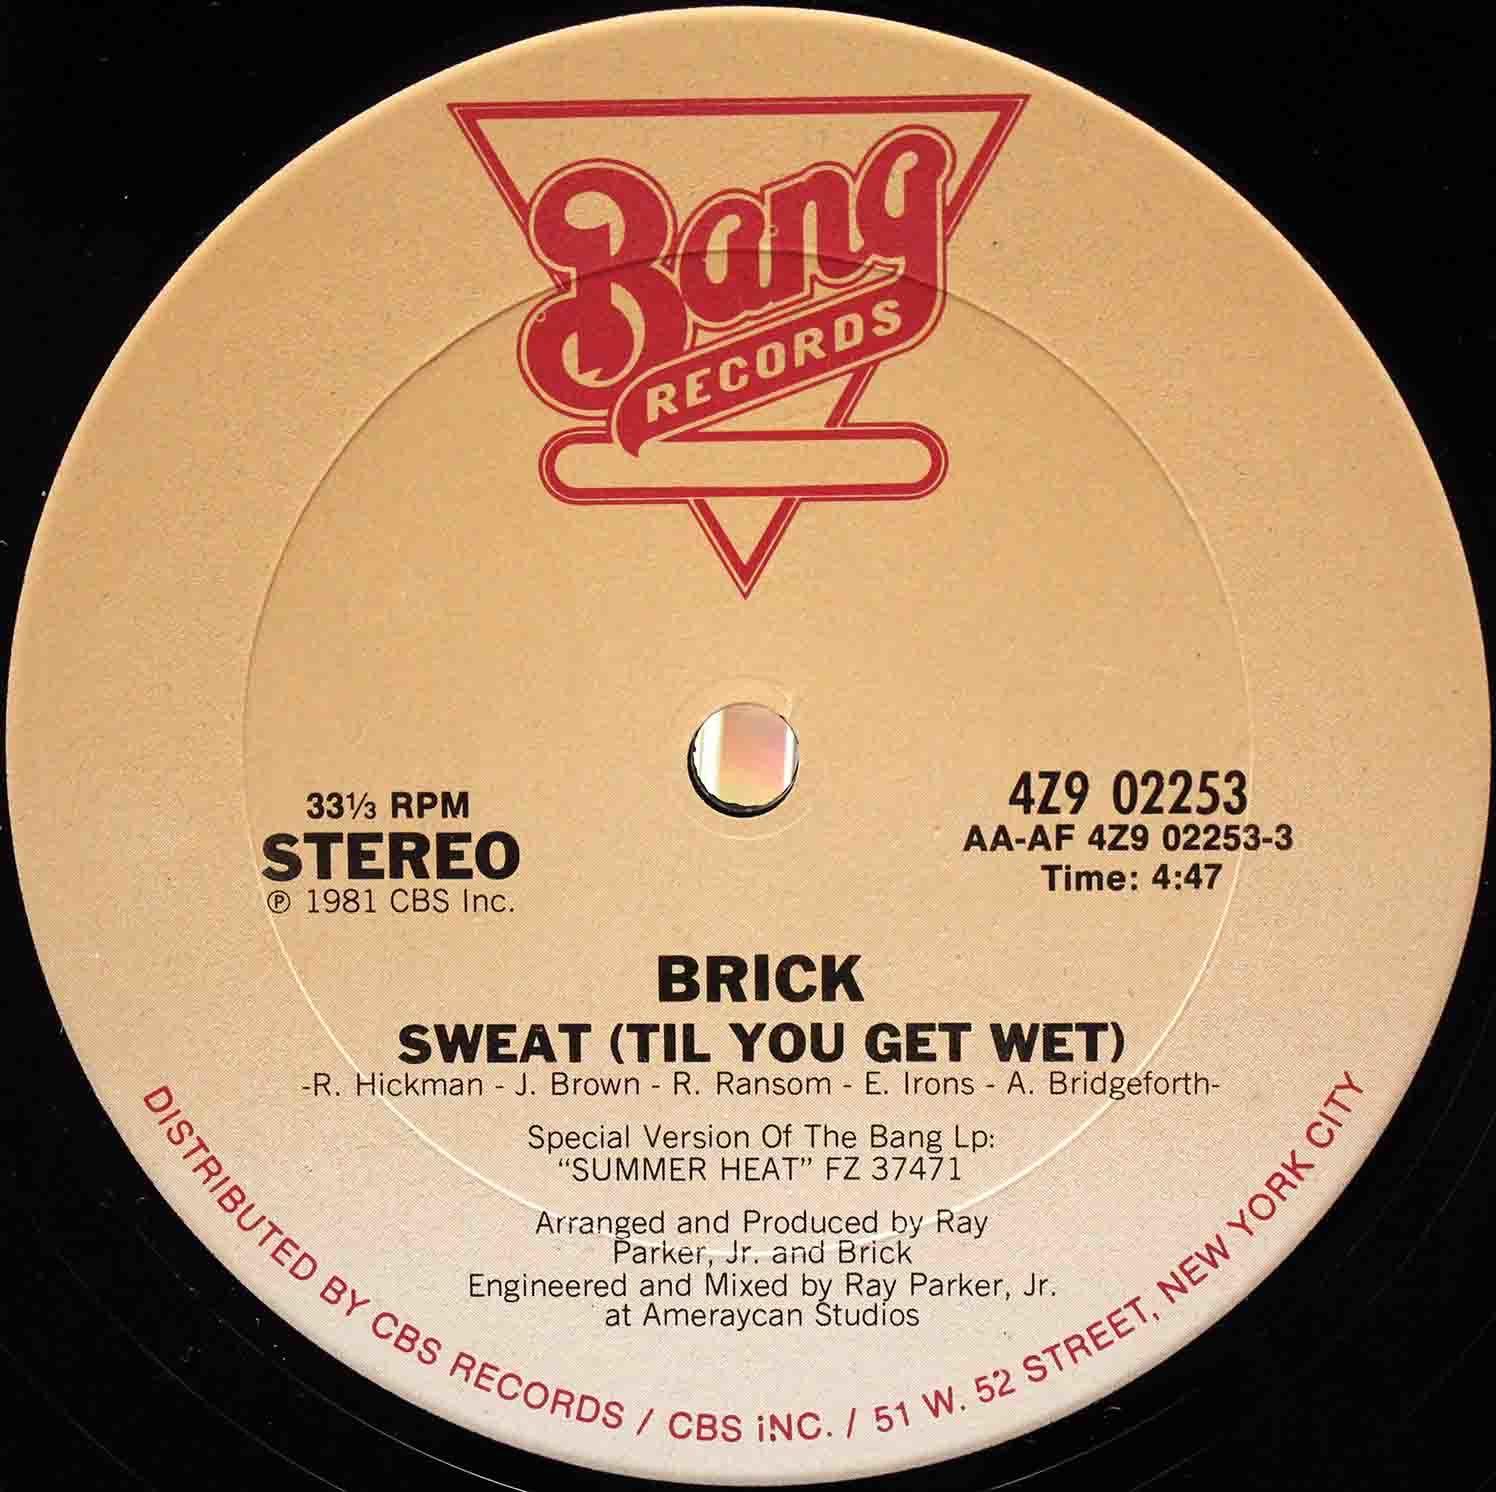 Brick - Sweat 03